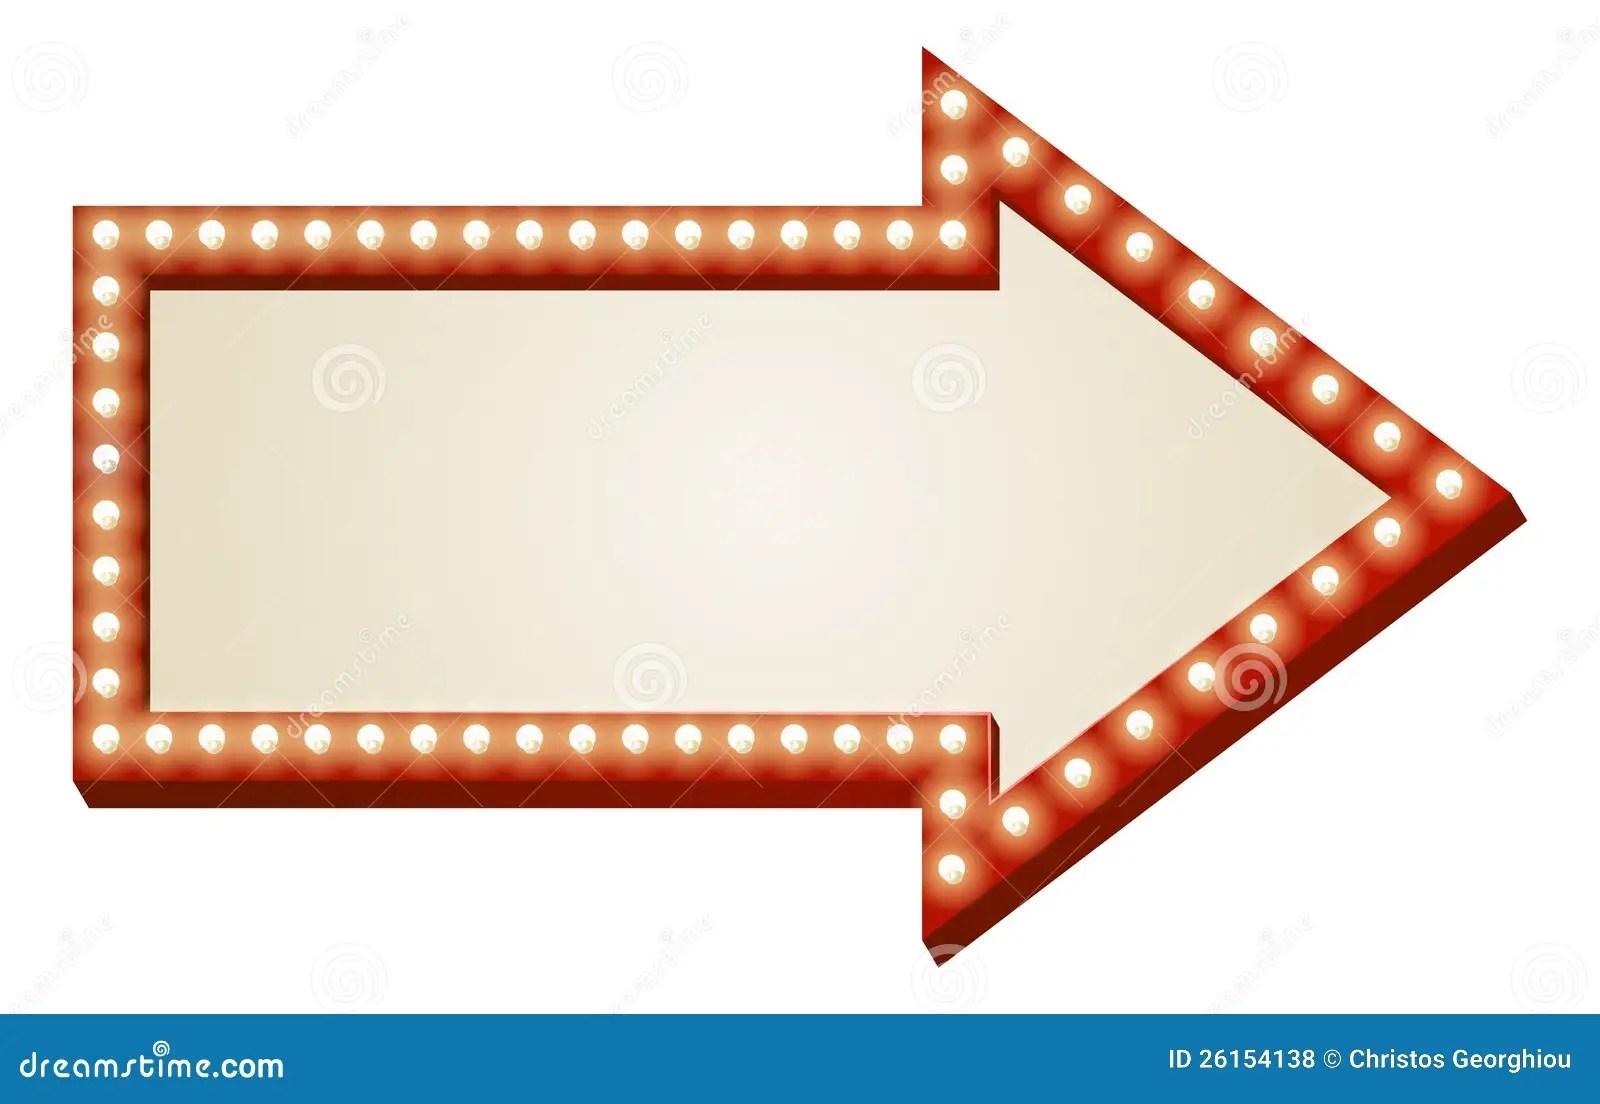 Major Light Bulb Manufacturers